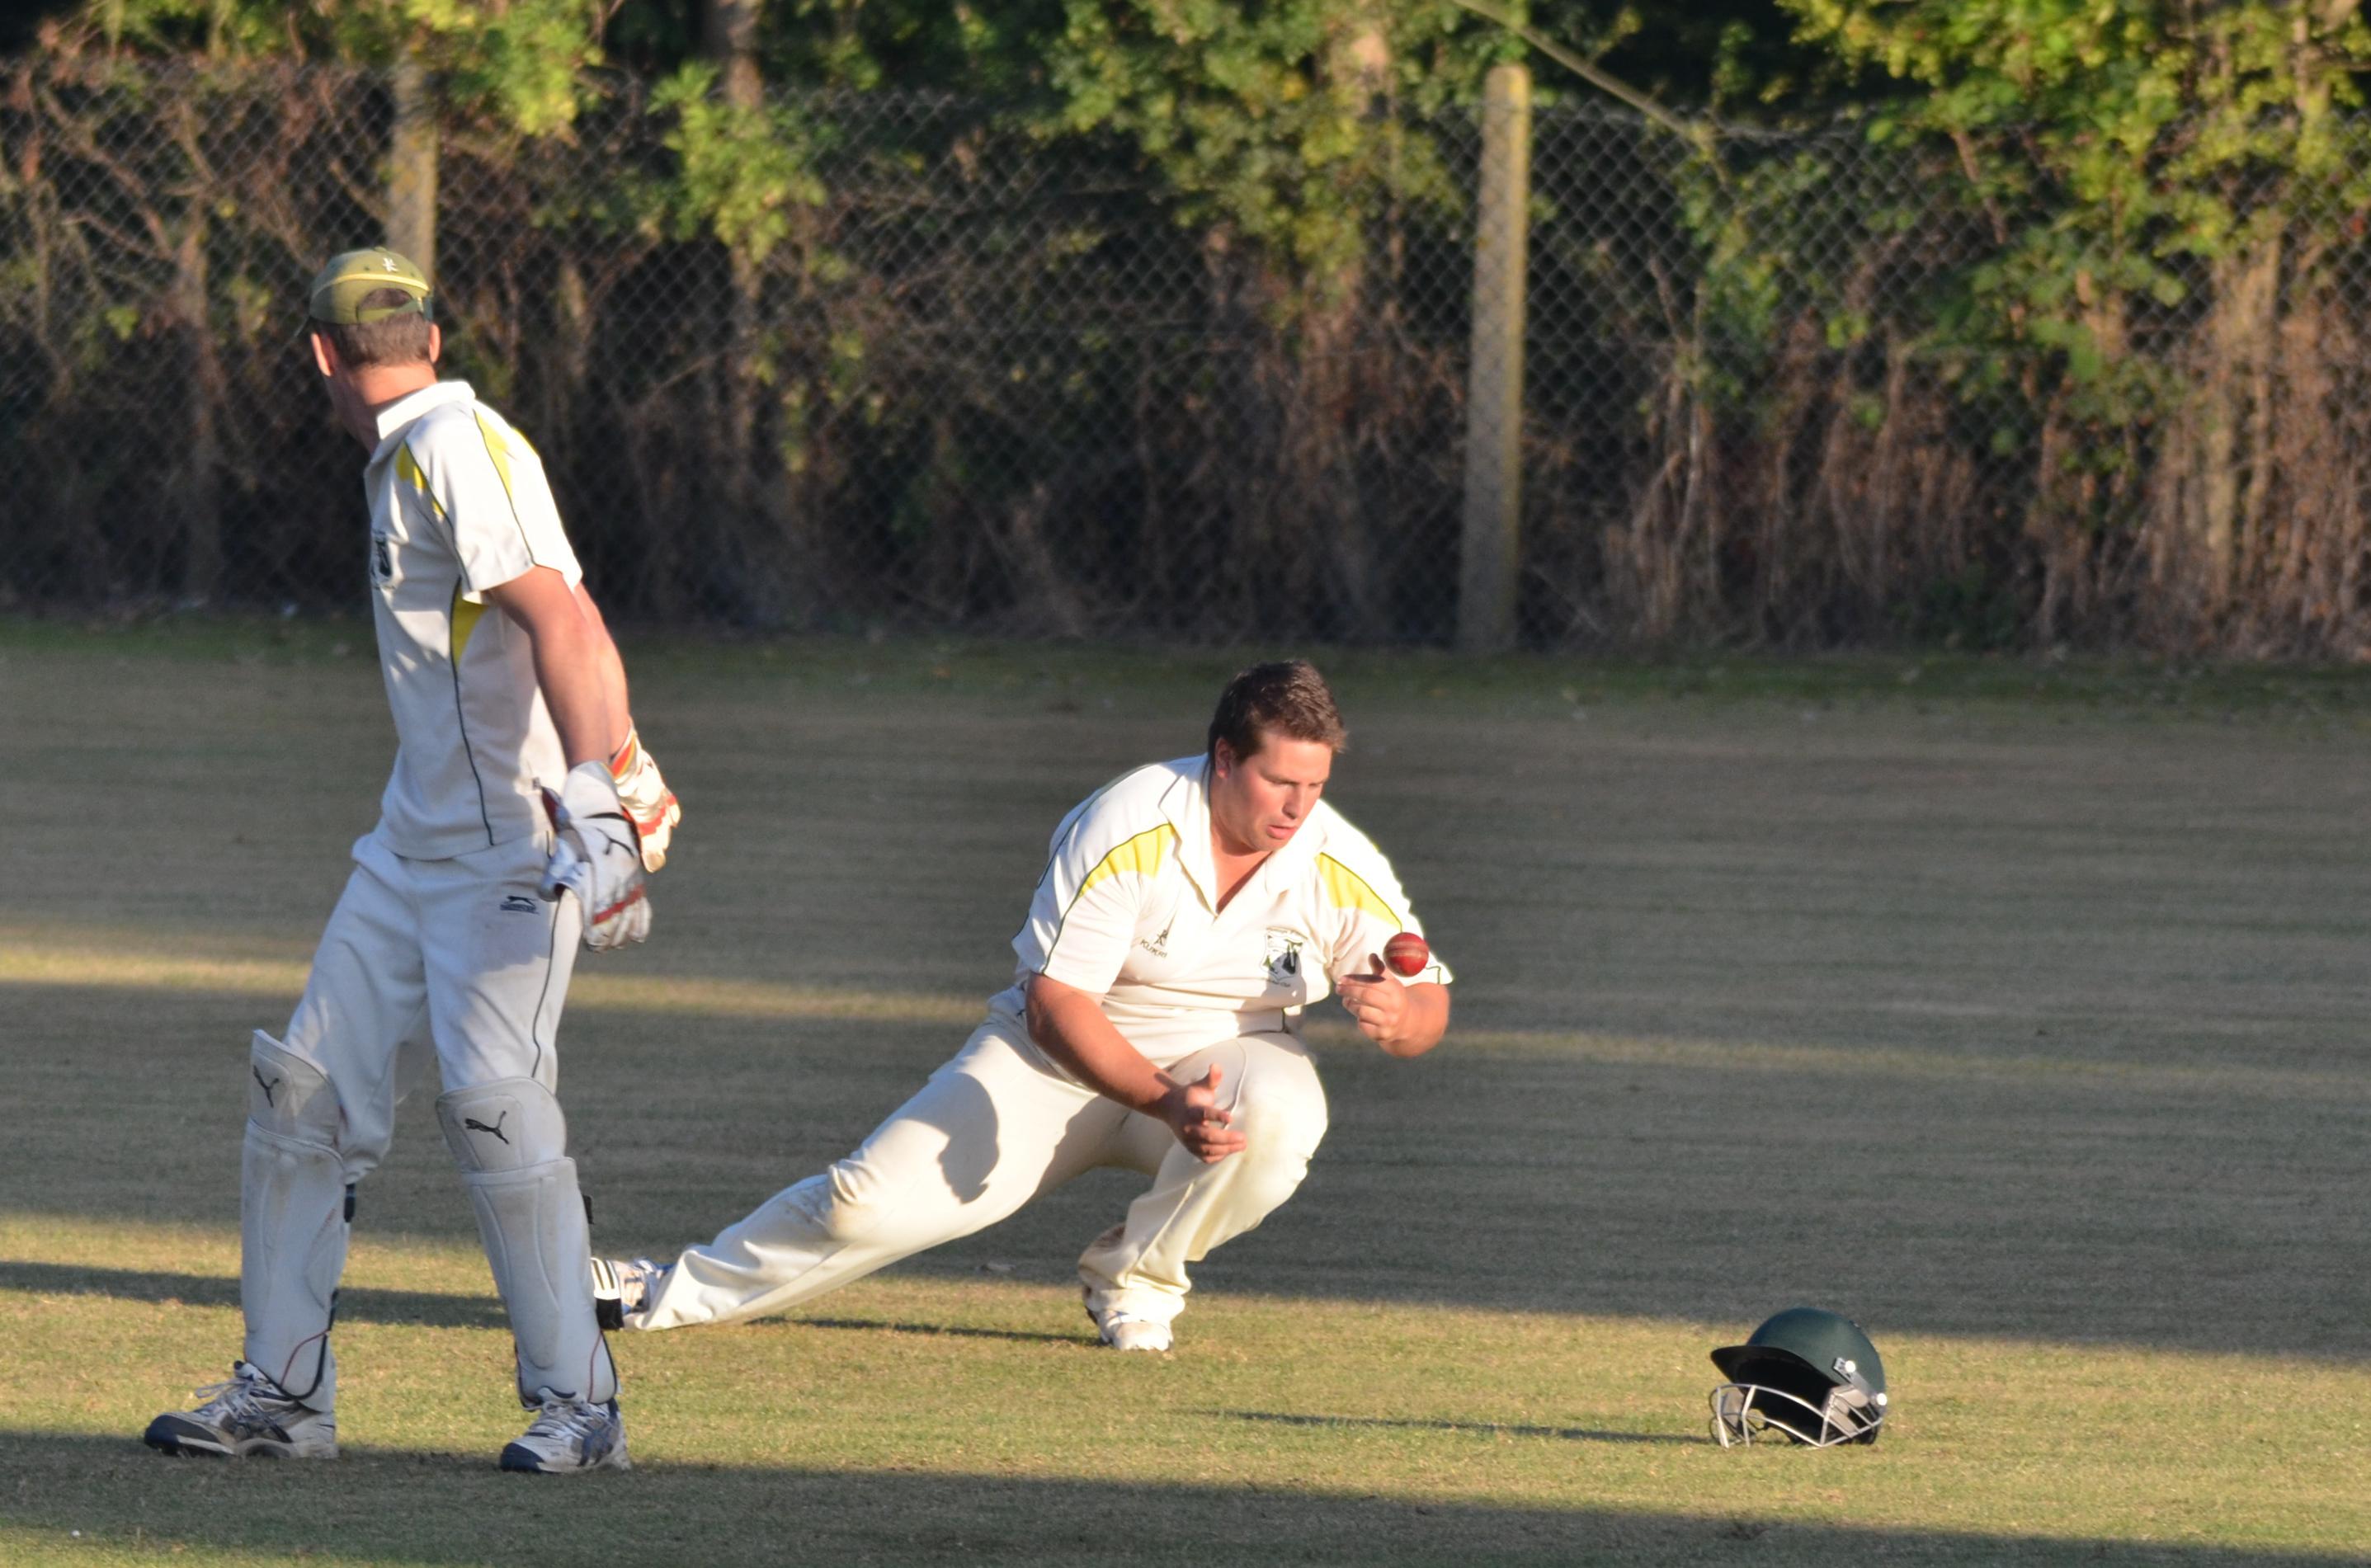 Wantage Cricket Club vs Britwell Salome 2013 244-slip-catch-fumble_edited-1